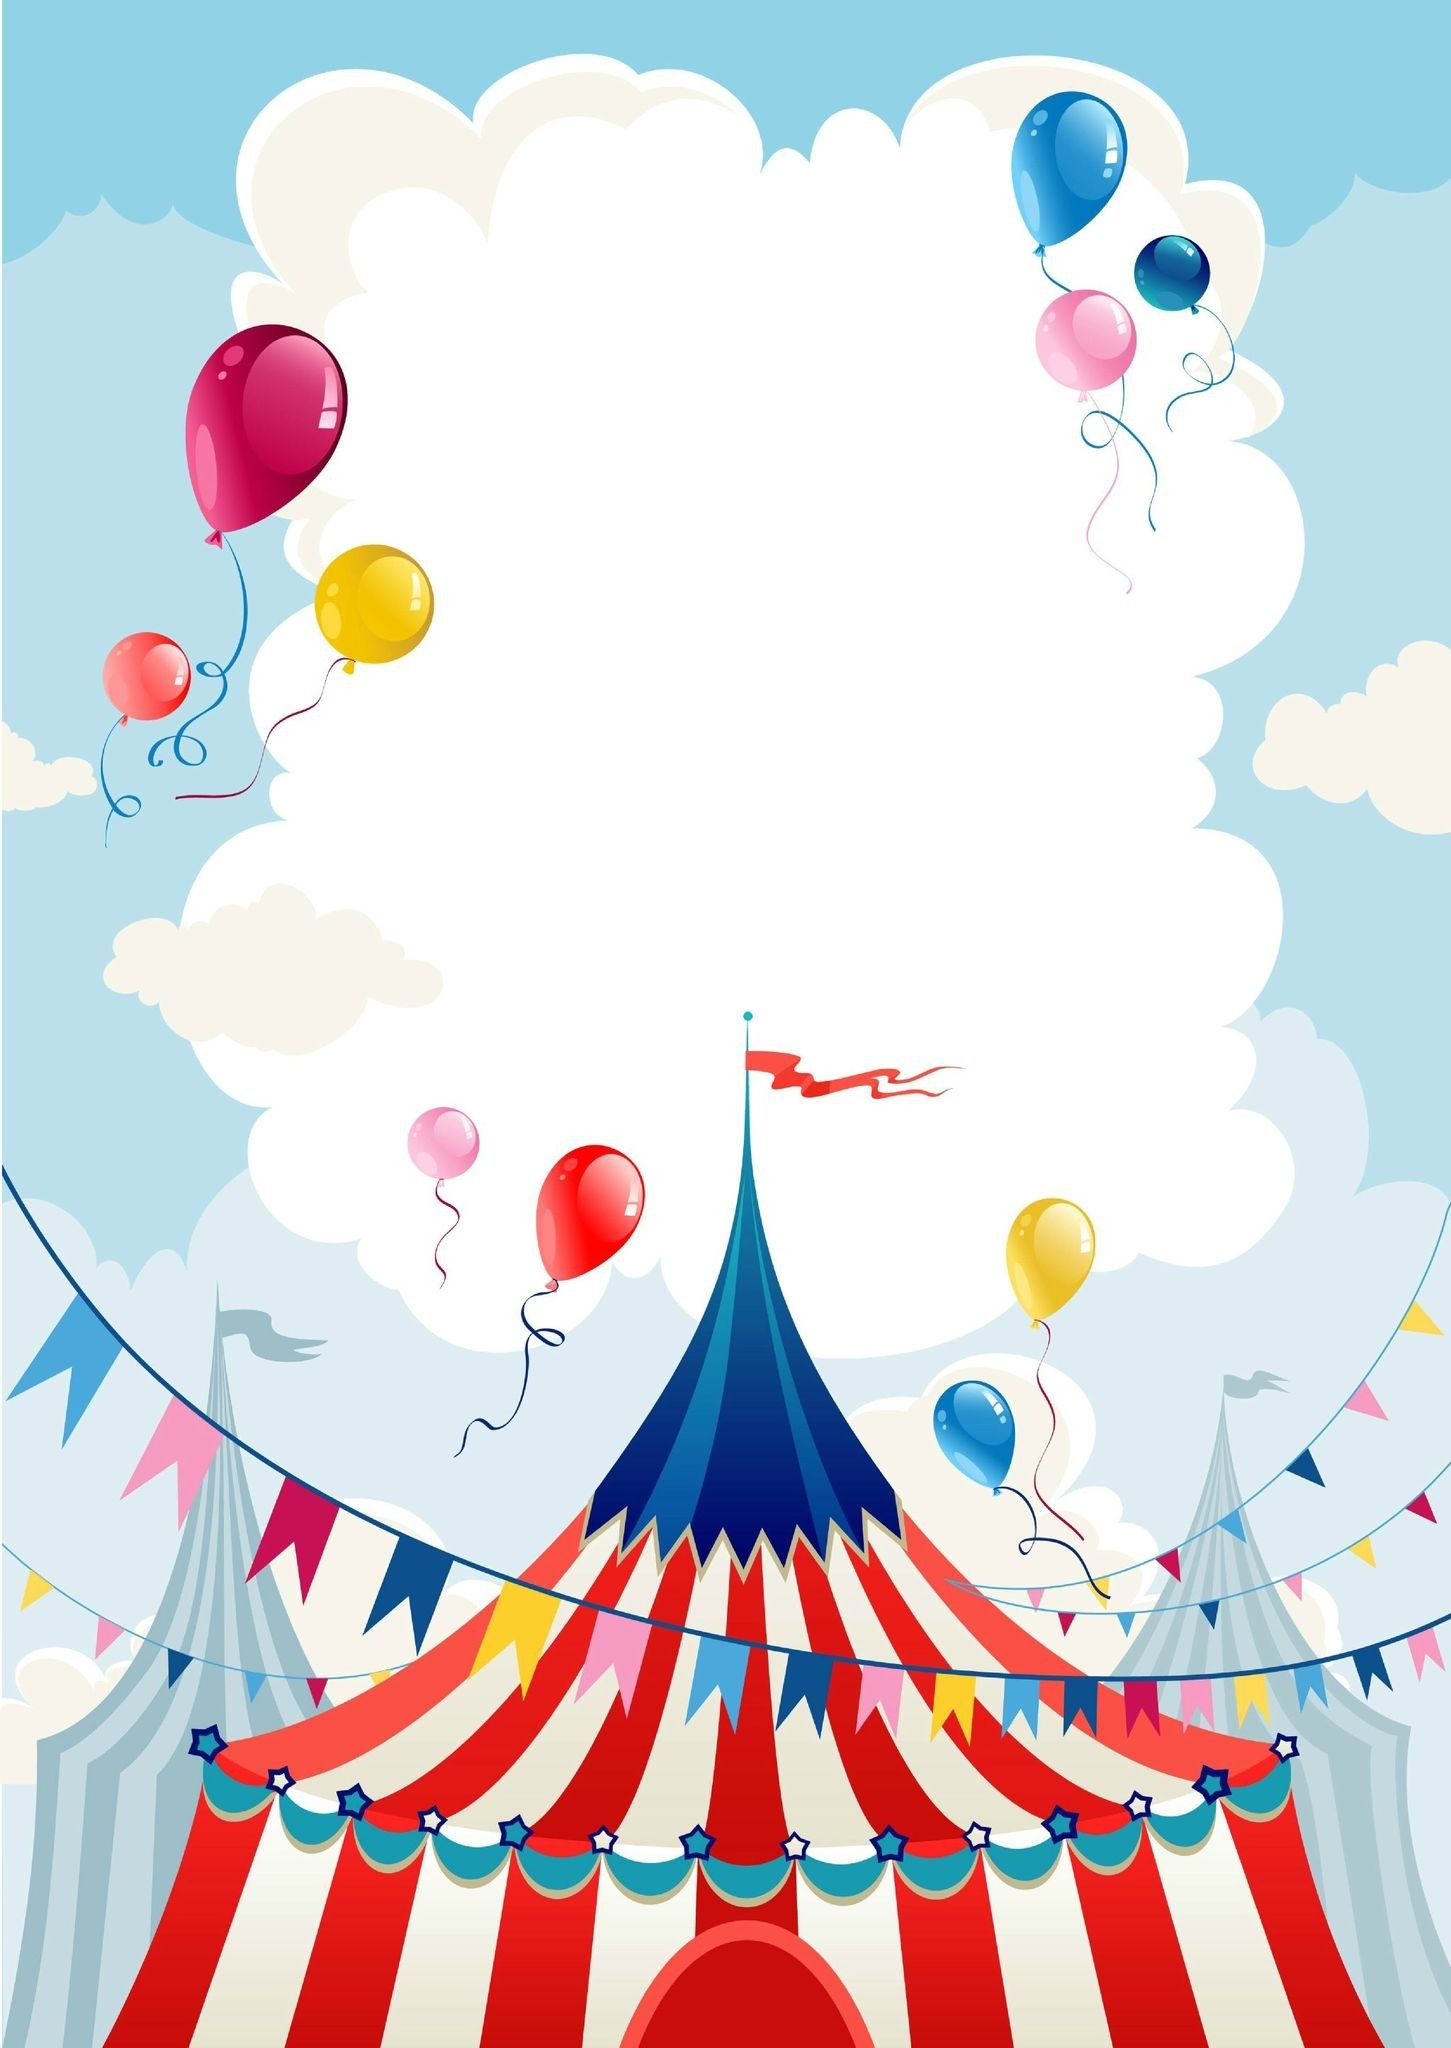 Circus theme wallpapers top free circus theme - Carnival wallpaper ...